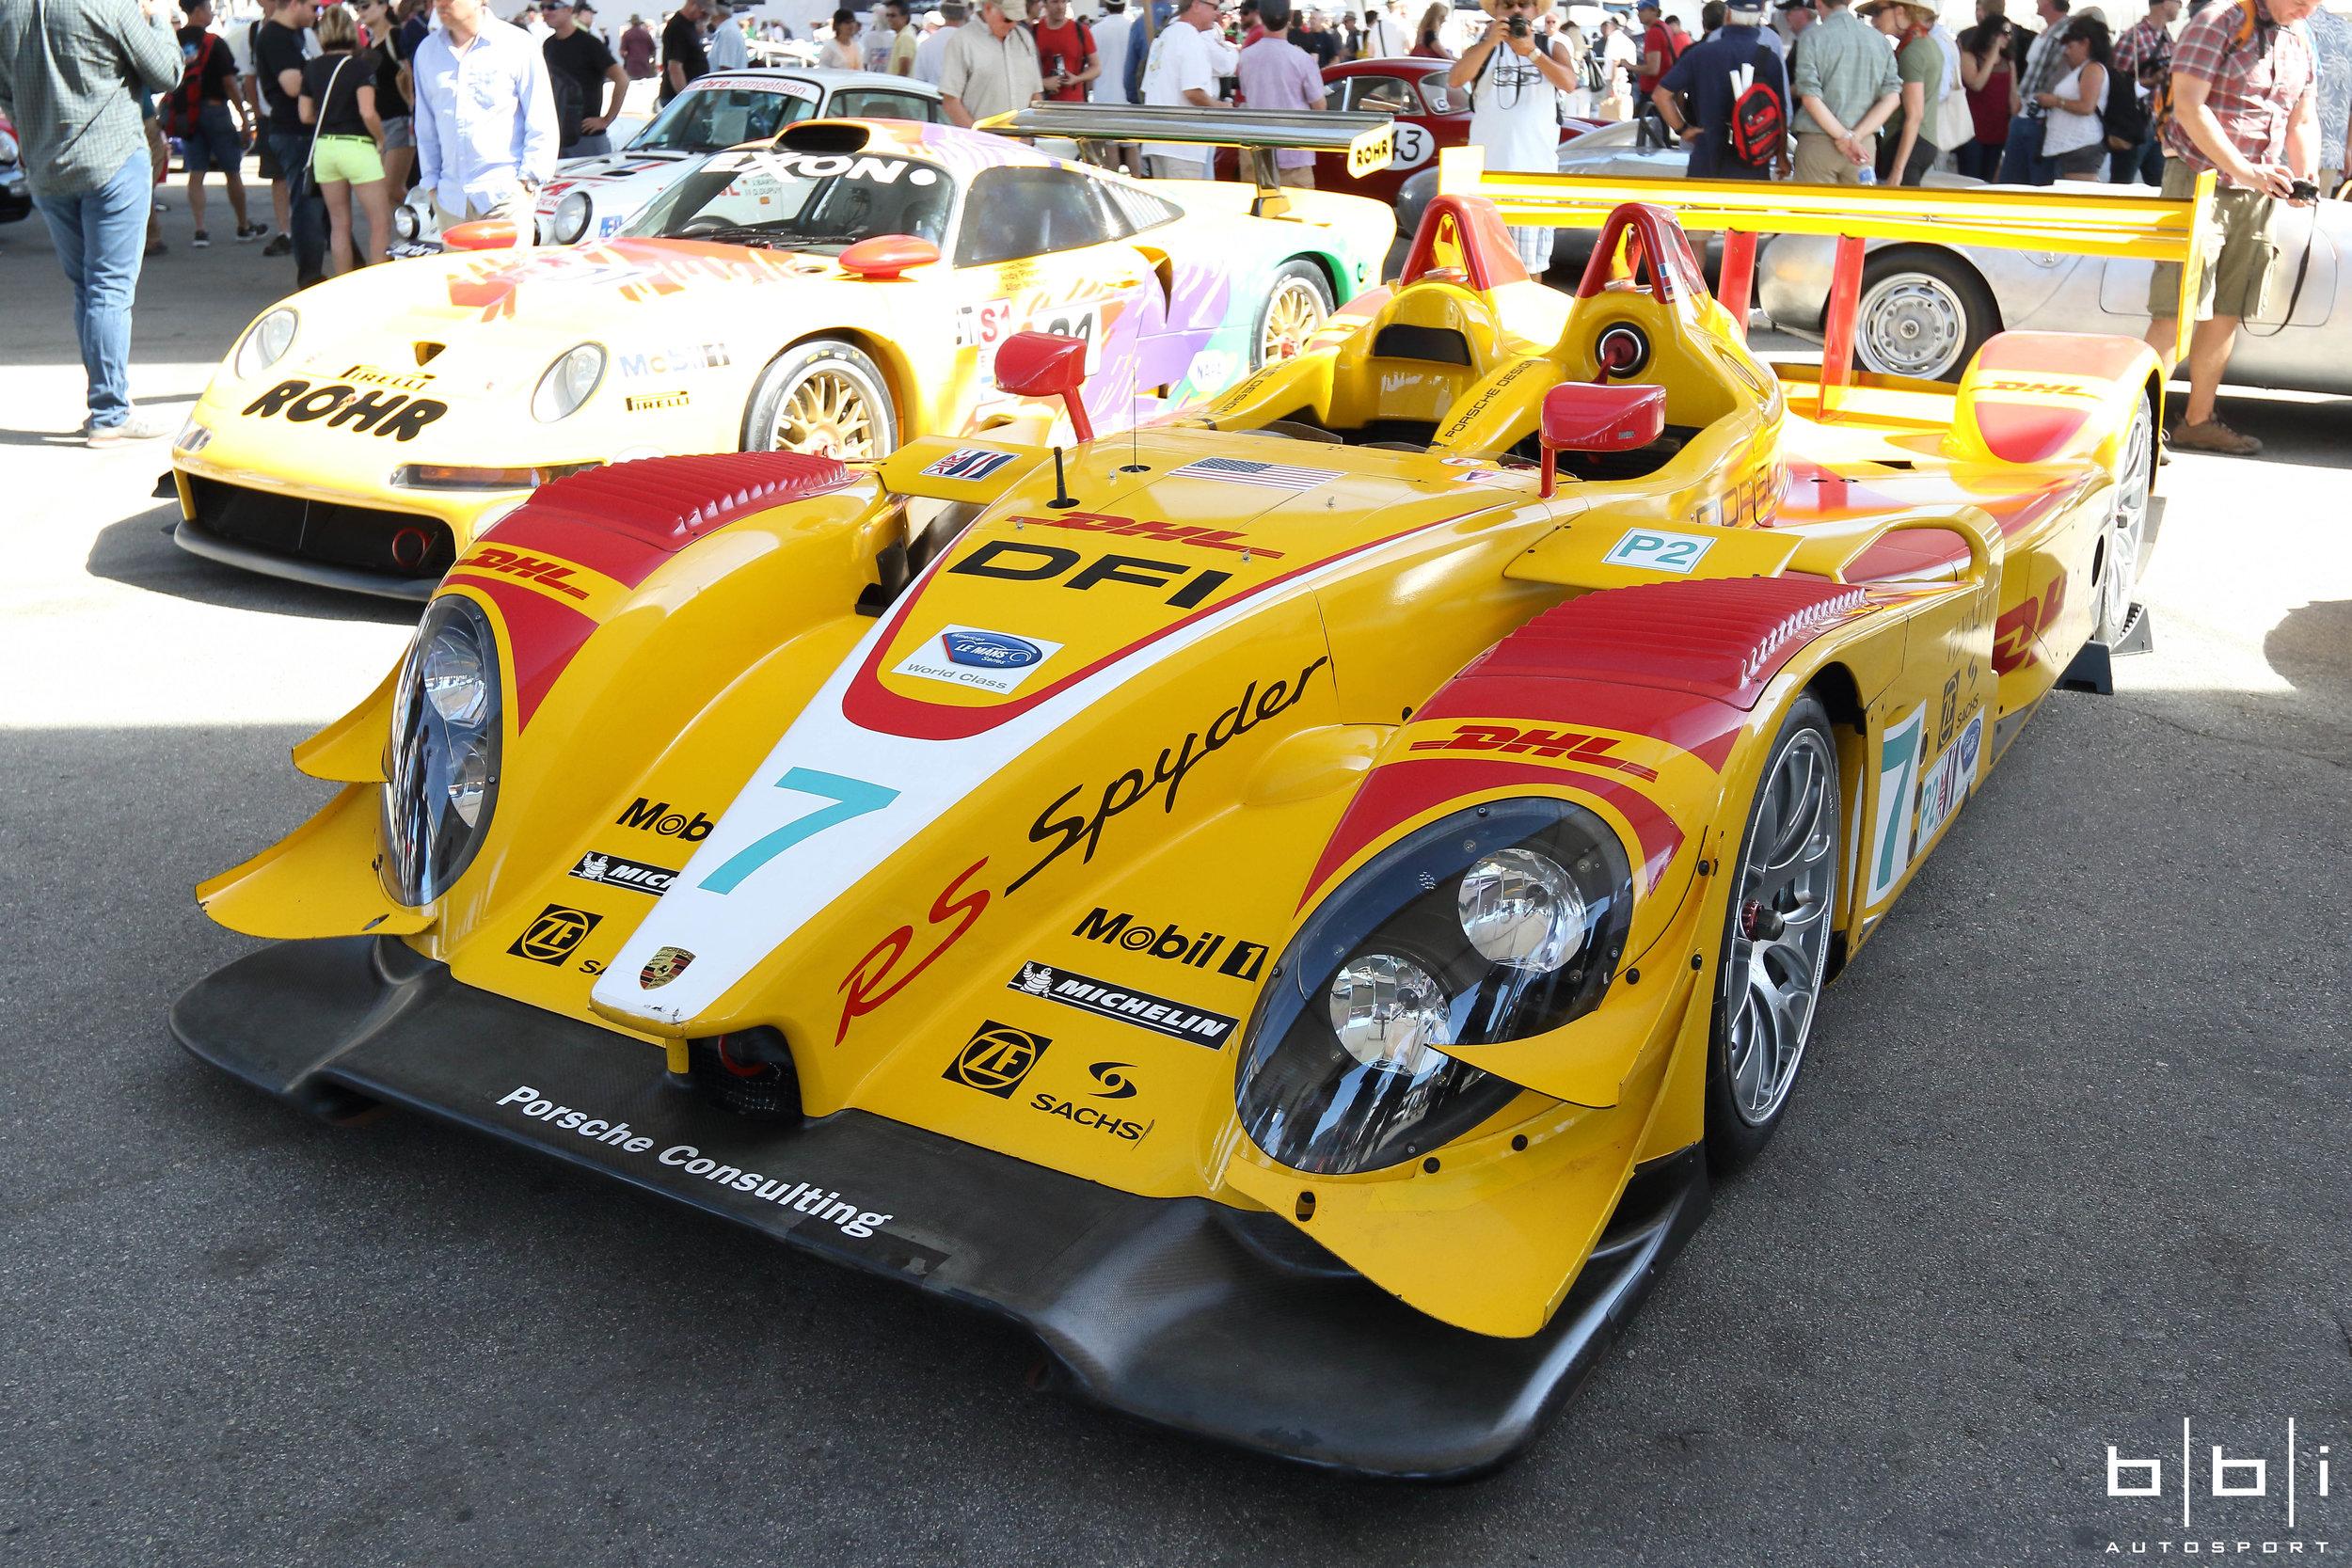 Porsche RS Spyder Evo #7 Penske Racing